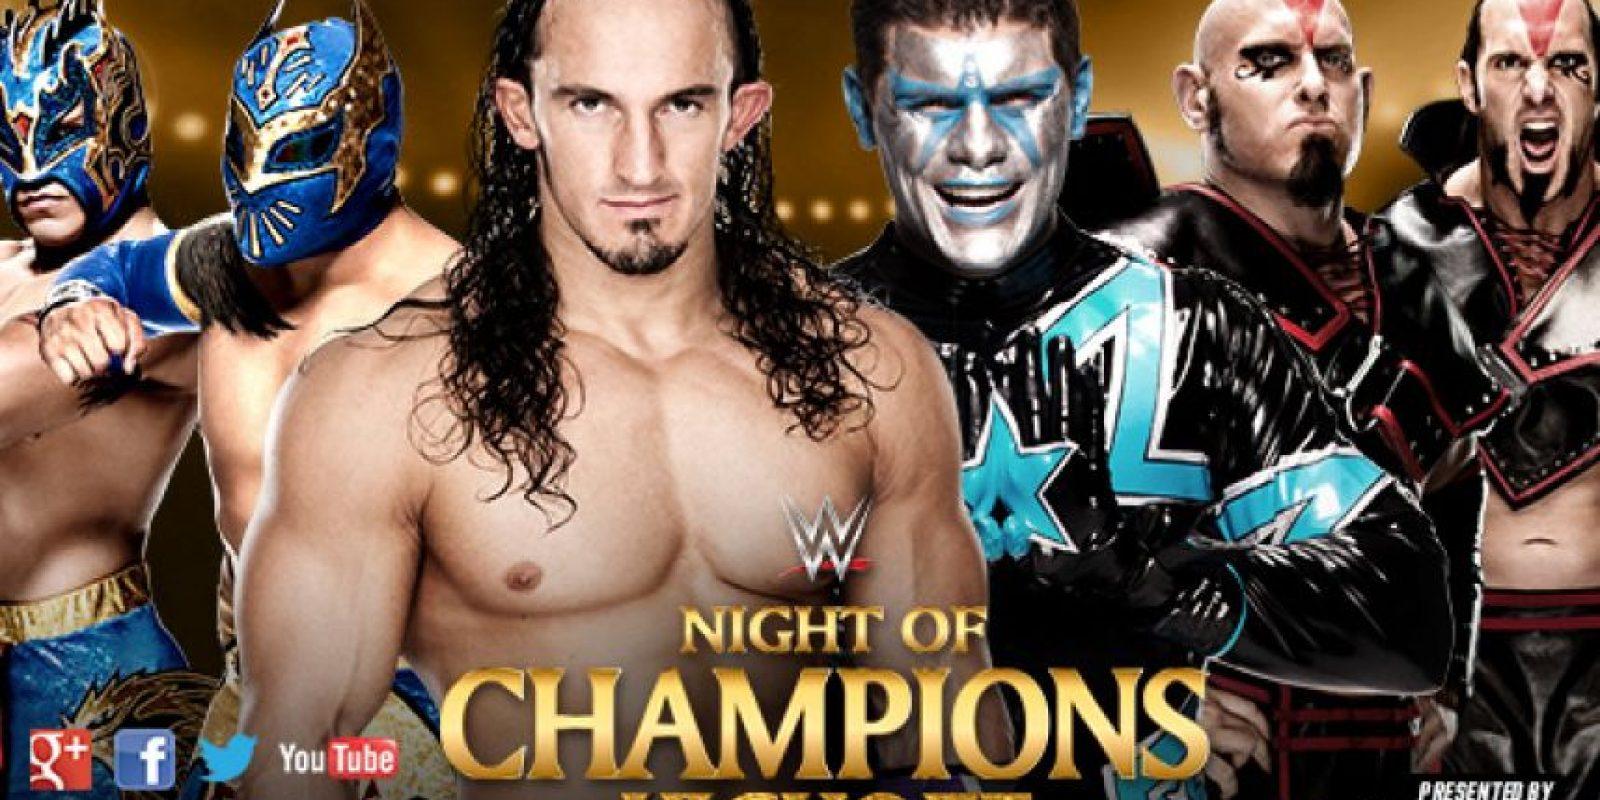 Kick-Off: Neville y The Lucha Dragons (Kalisto y Sin Cara) vs. The Cosmic Wasteland (Stardust y The Ascension [Konnor y Víctor]). Foto:WWE